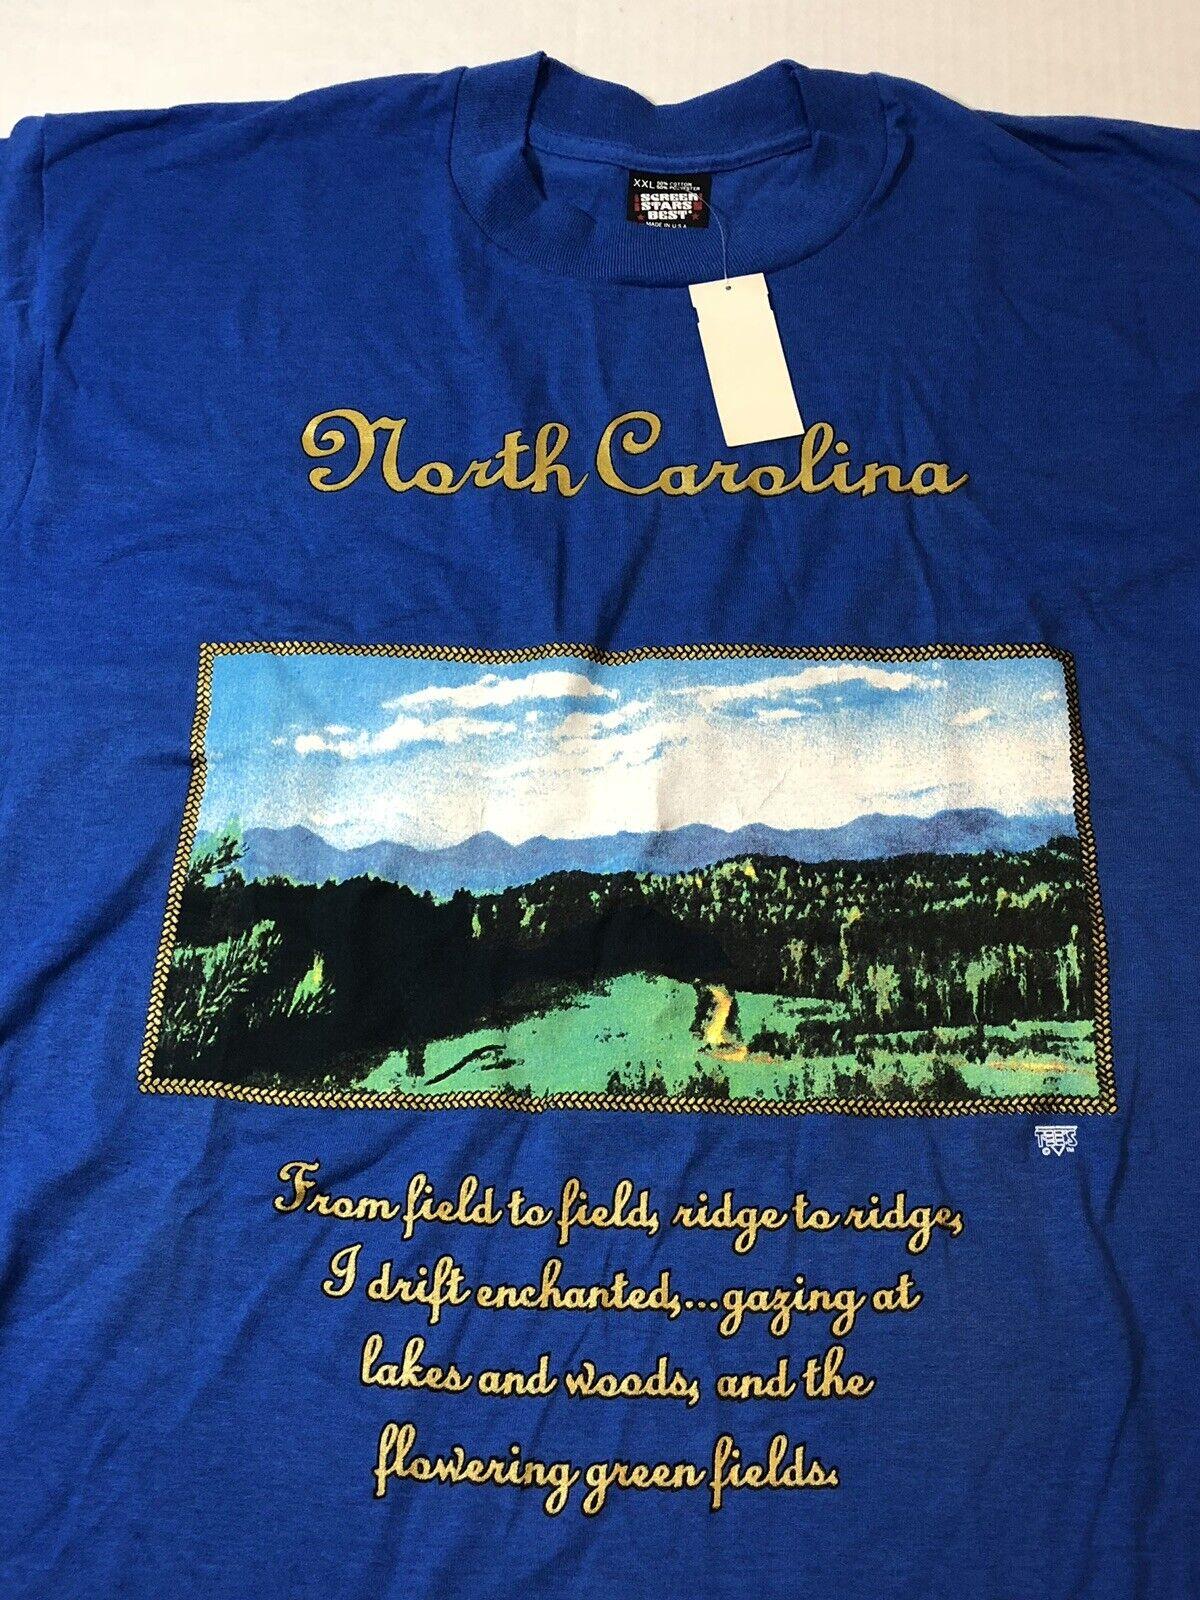 12d8a70b7 Vintage T-shirt 2xl Screen Stars Best North Rare Find Tags USA Carolina  With nydzvn3337-T-Shirts